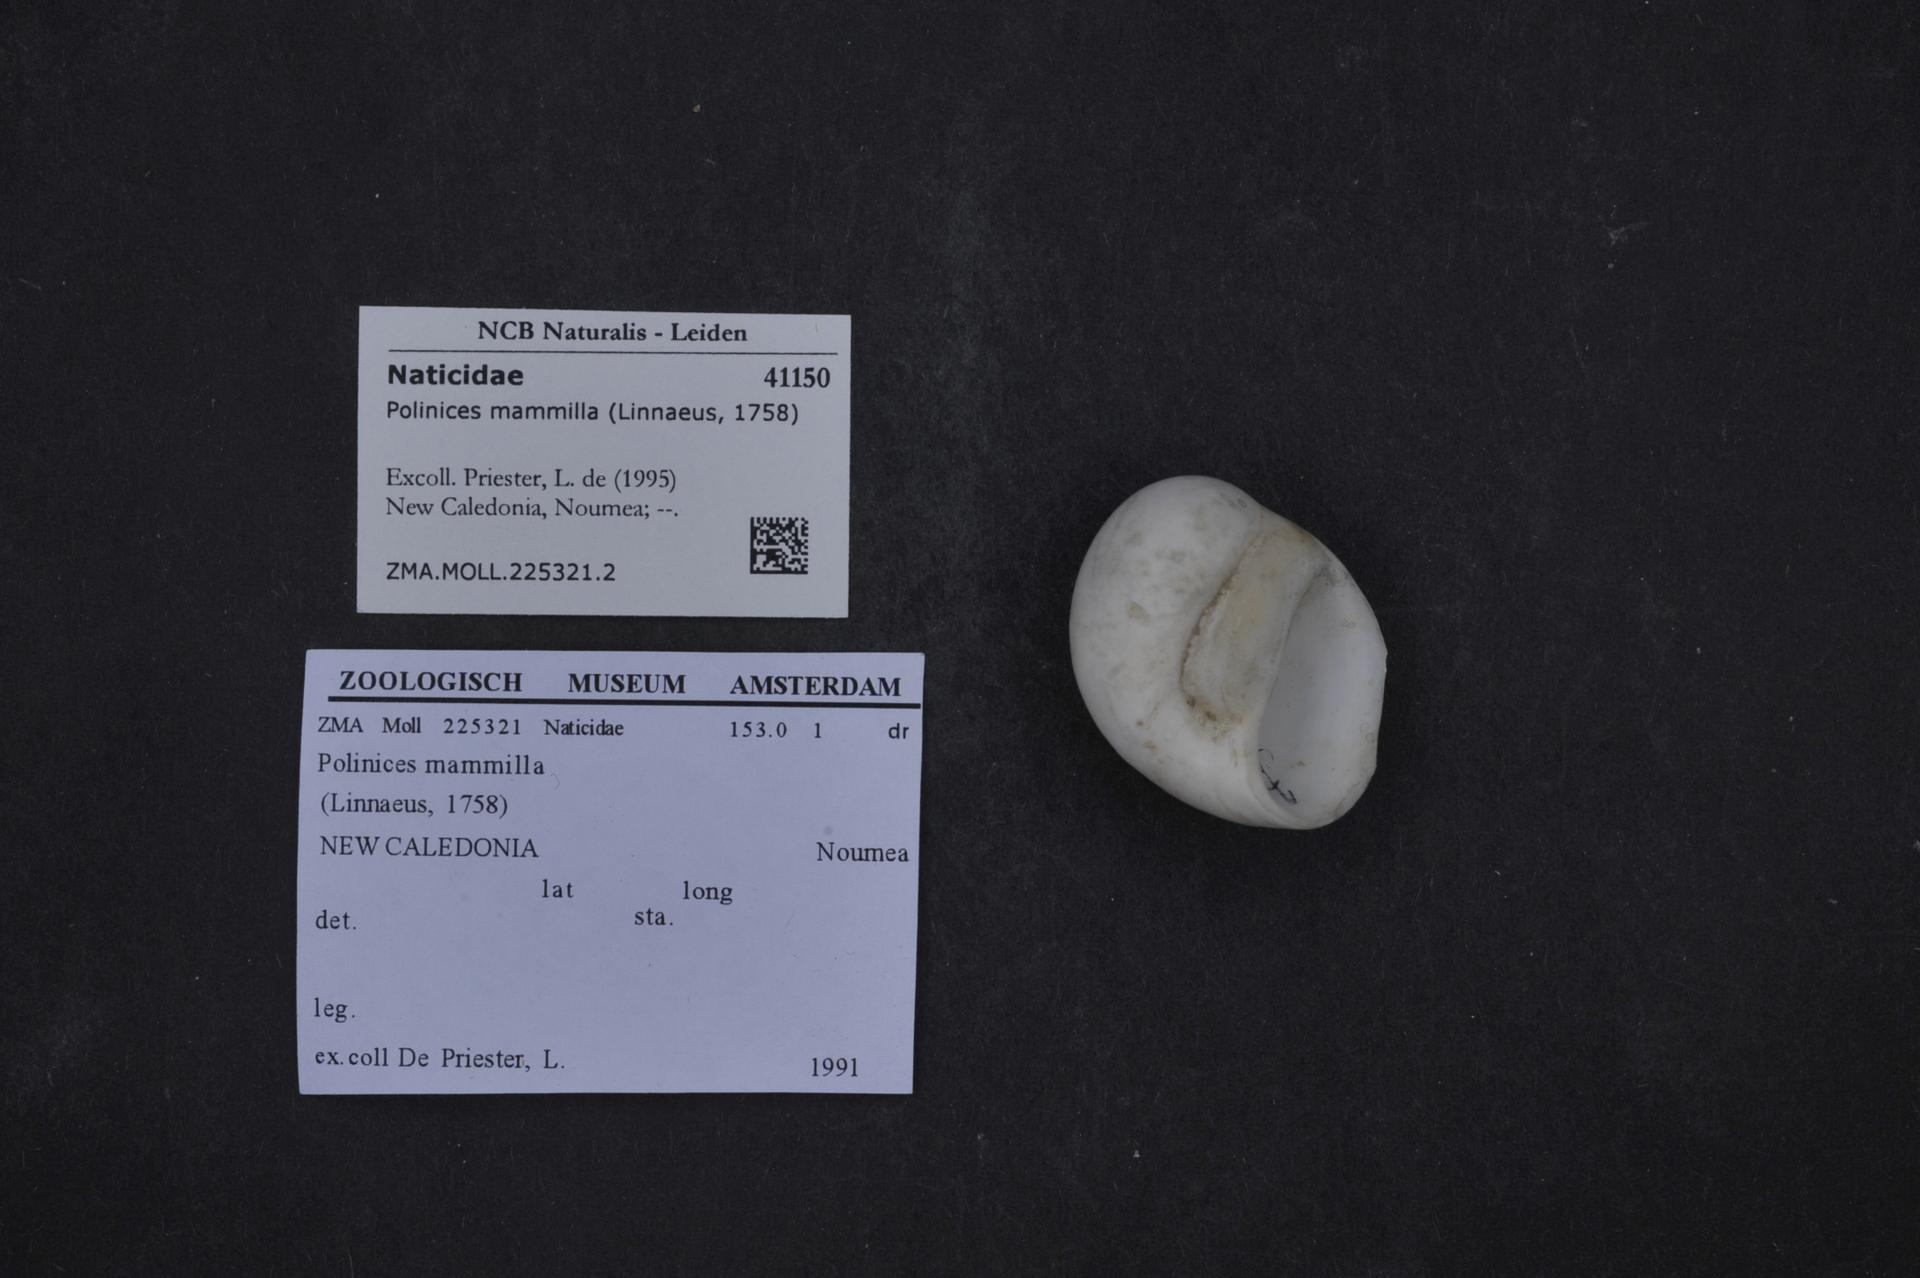 ZMA.MOLL.225321.2 | Polinices mammilla (Linnaeus, 1758)